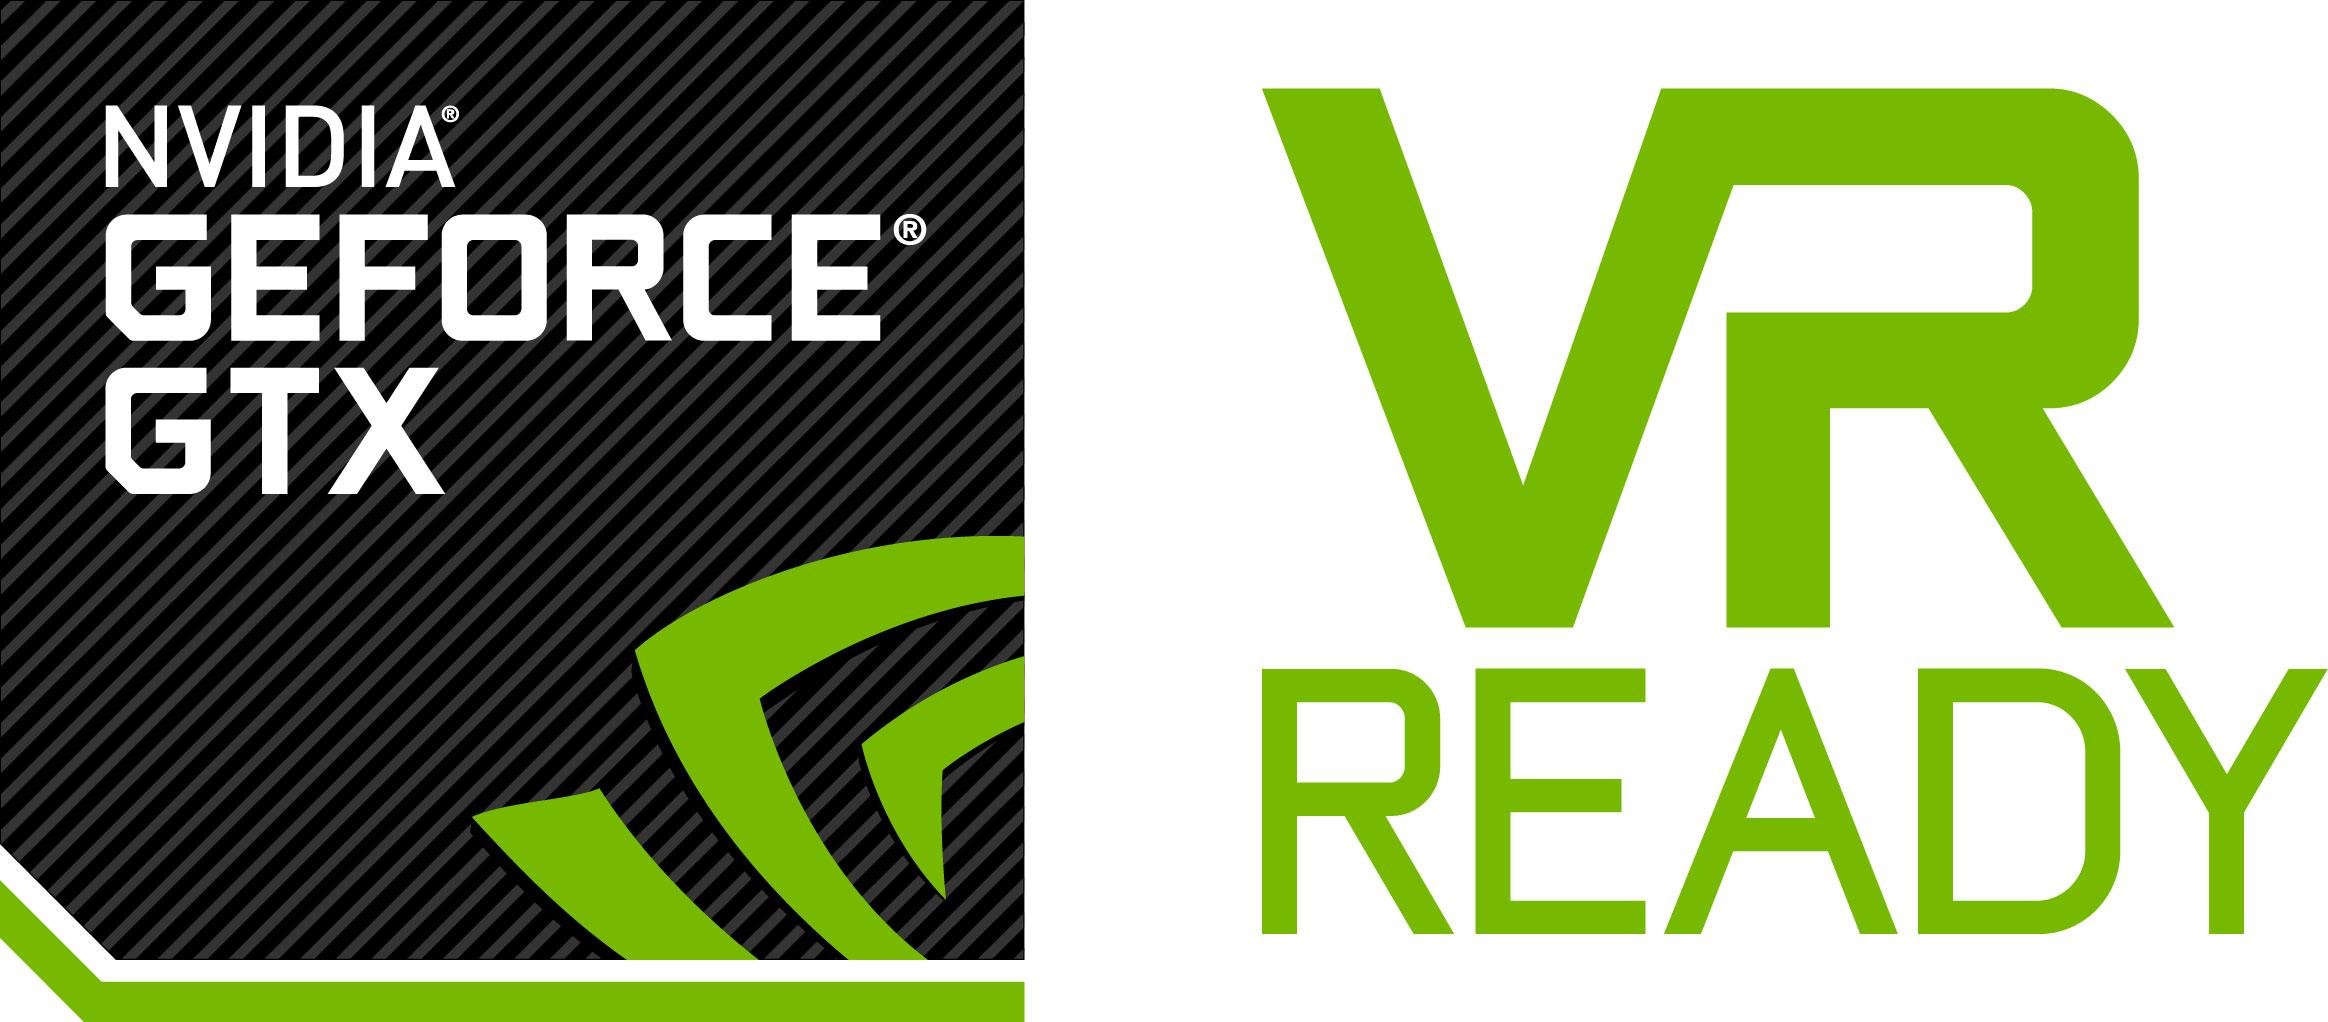 NV-GF-VR-Ready-logo-wht-RGB.jpg